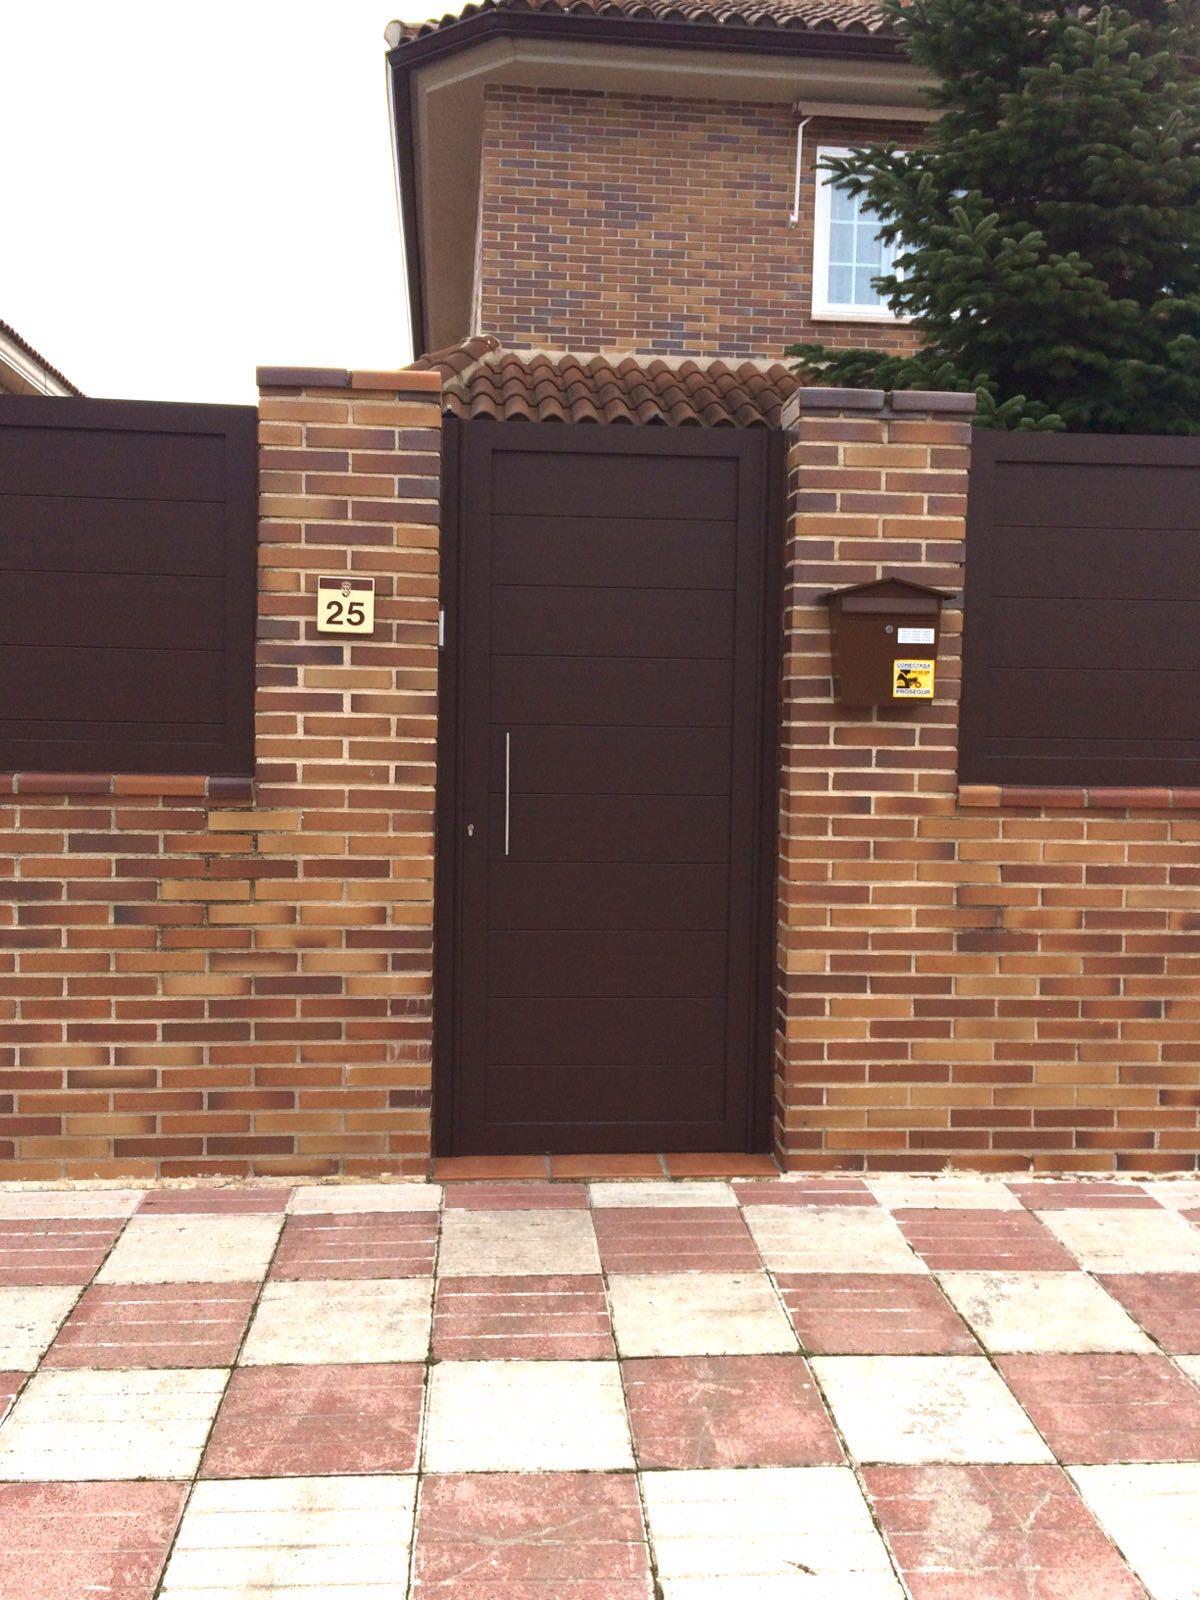 Puertas de aluminio para exterior modelo gri on patentado grupo marver - Puertas de aluminio de exterior ...